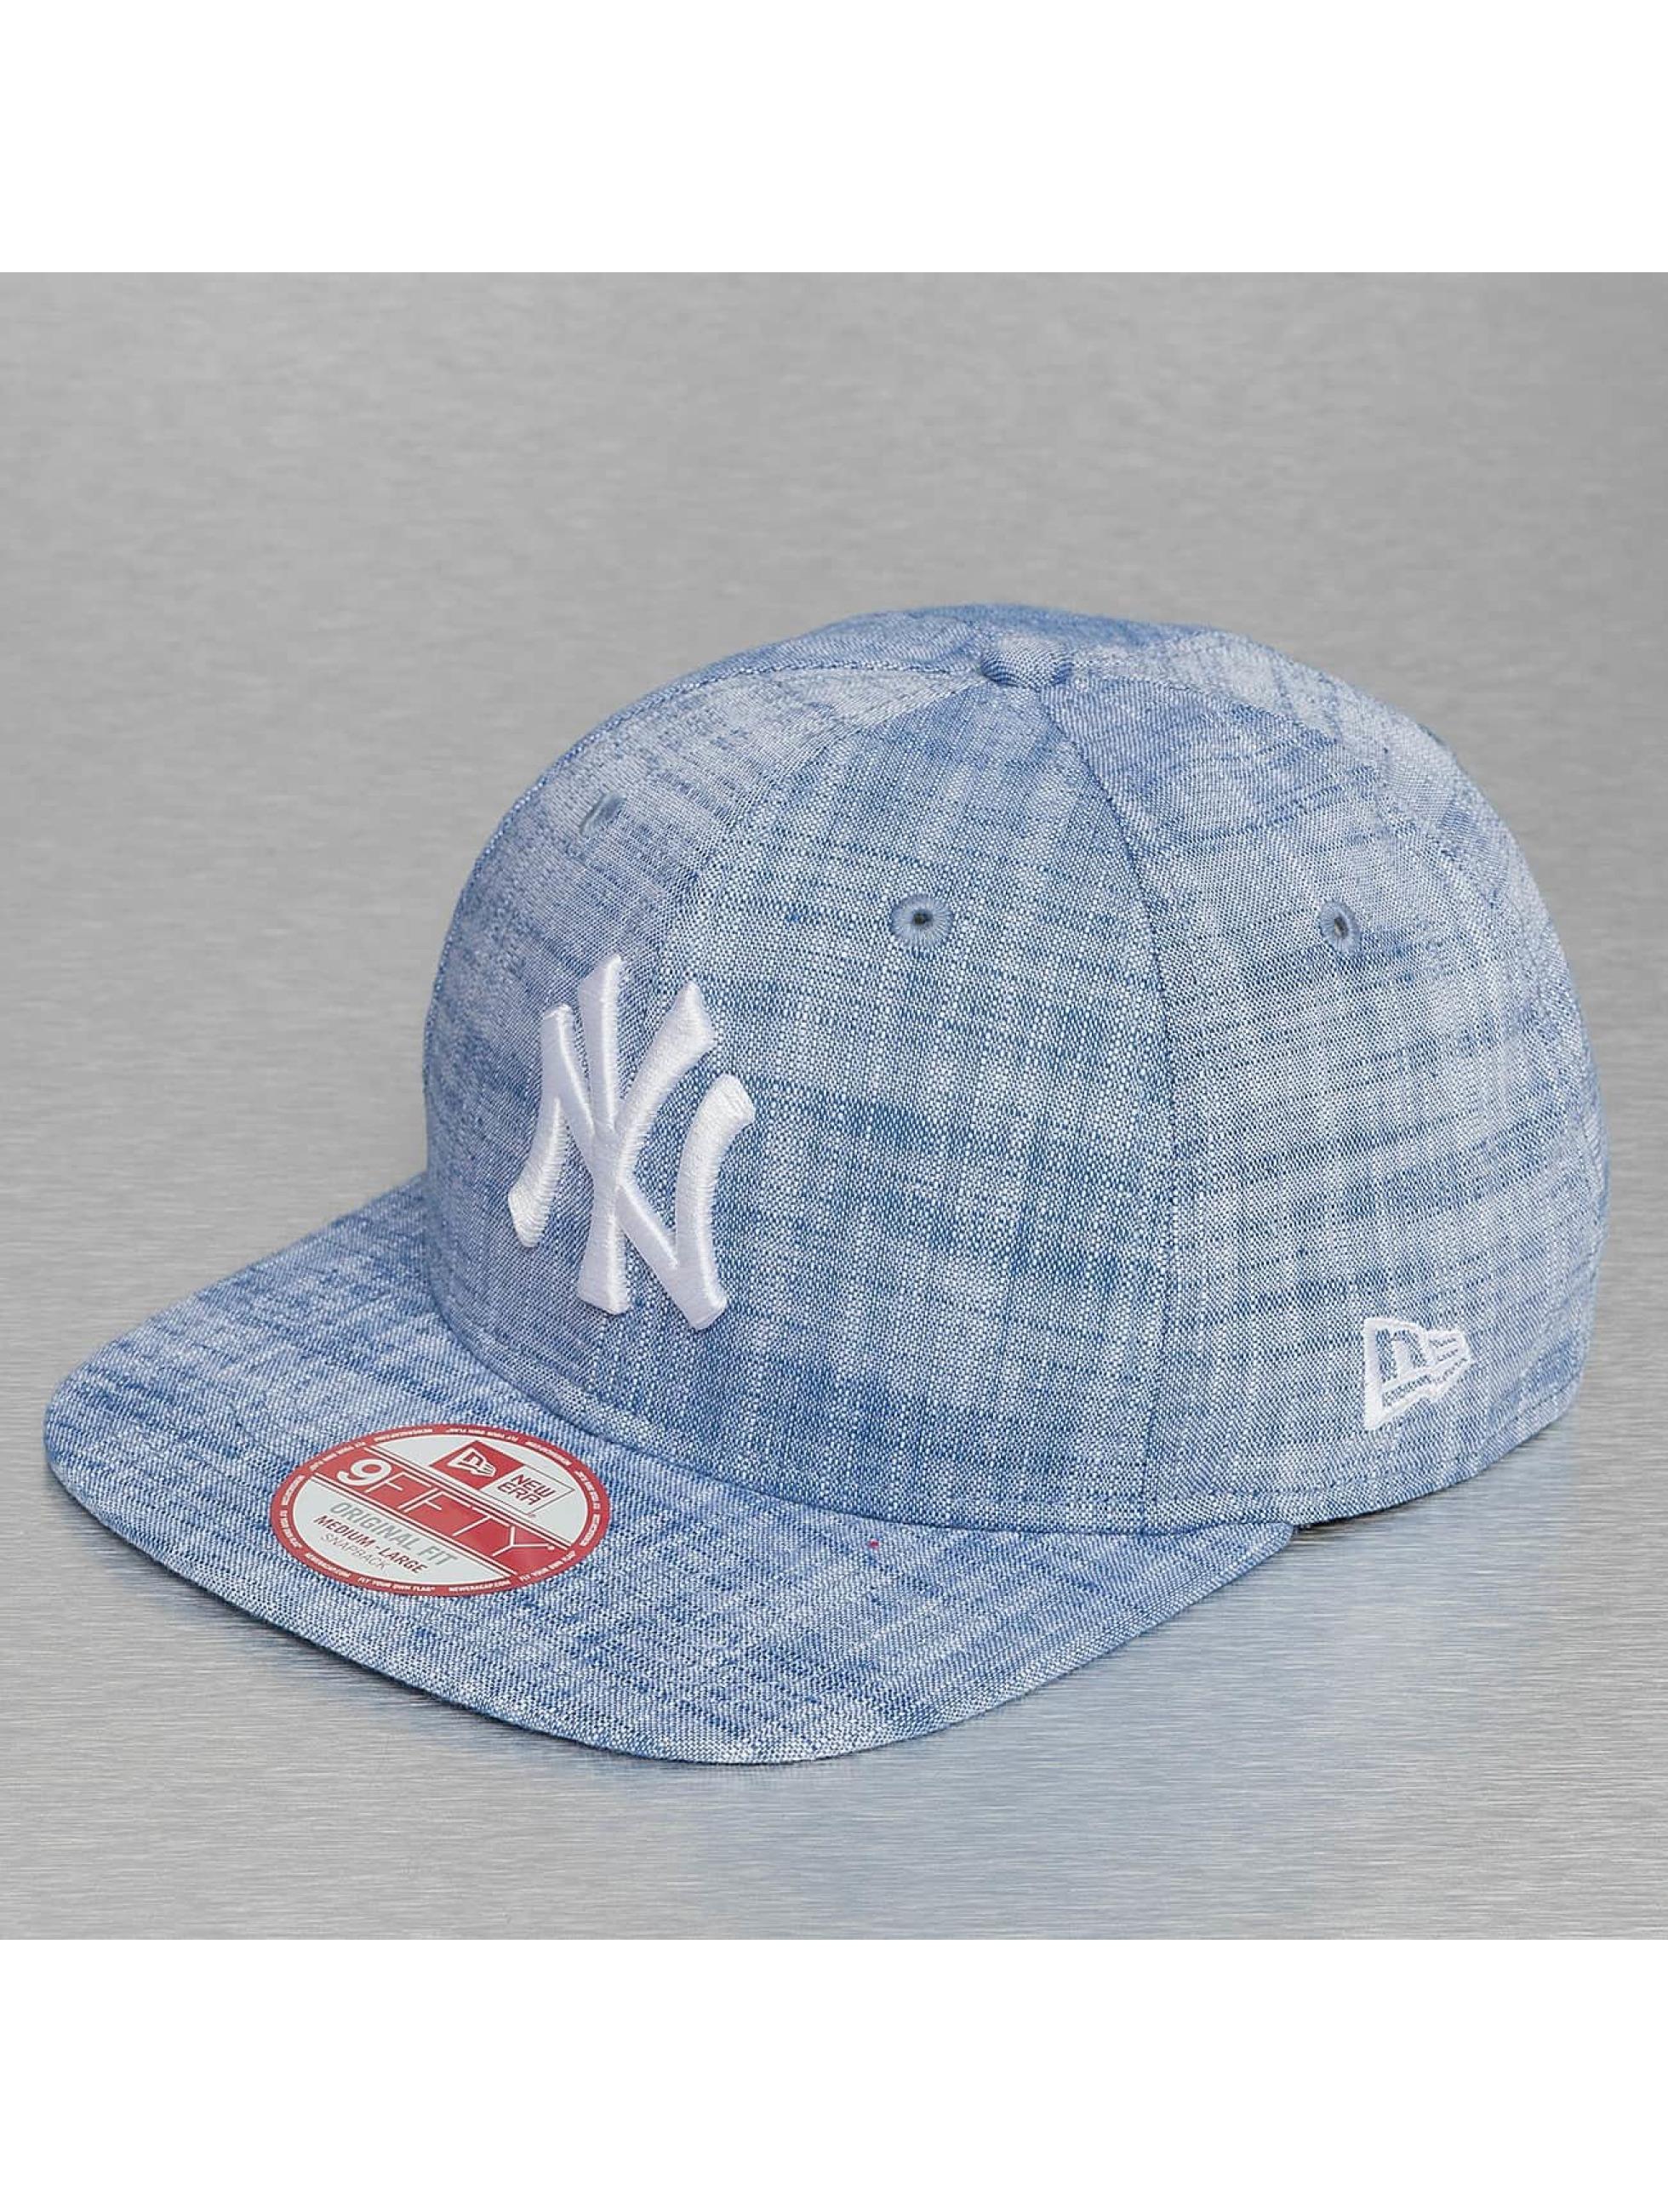 New Era Кепка с застёжкой MLB Chambray NY Yankees синий